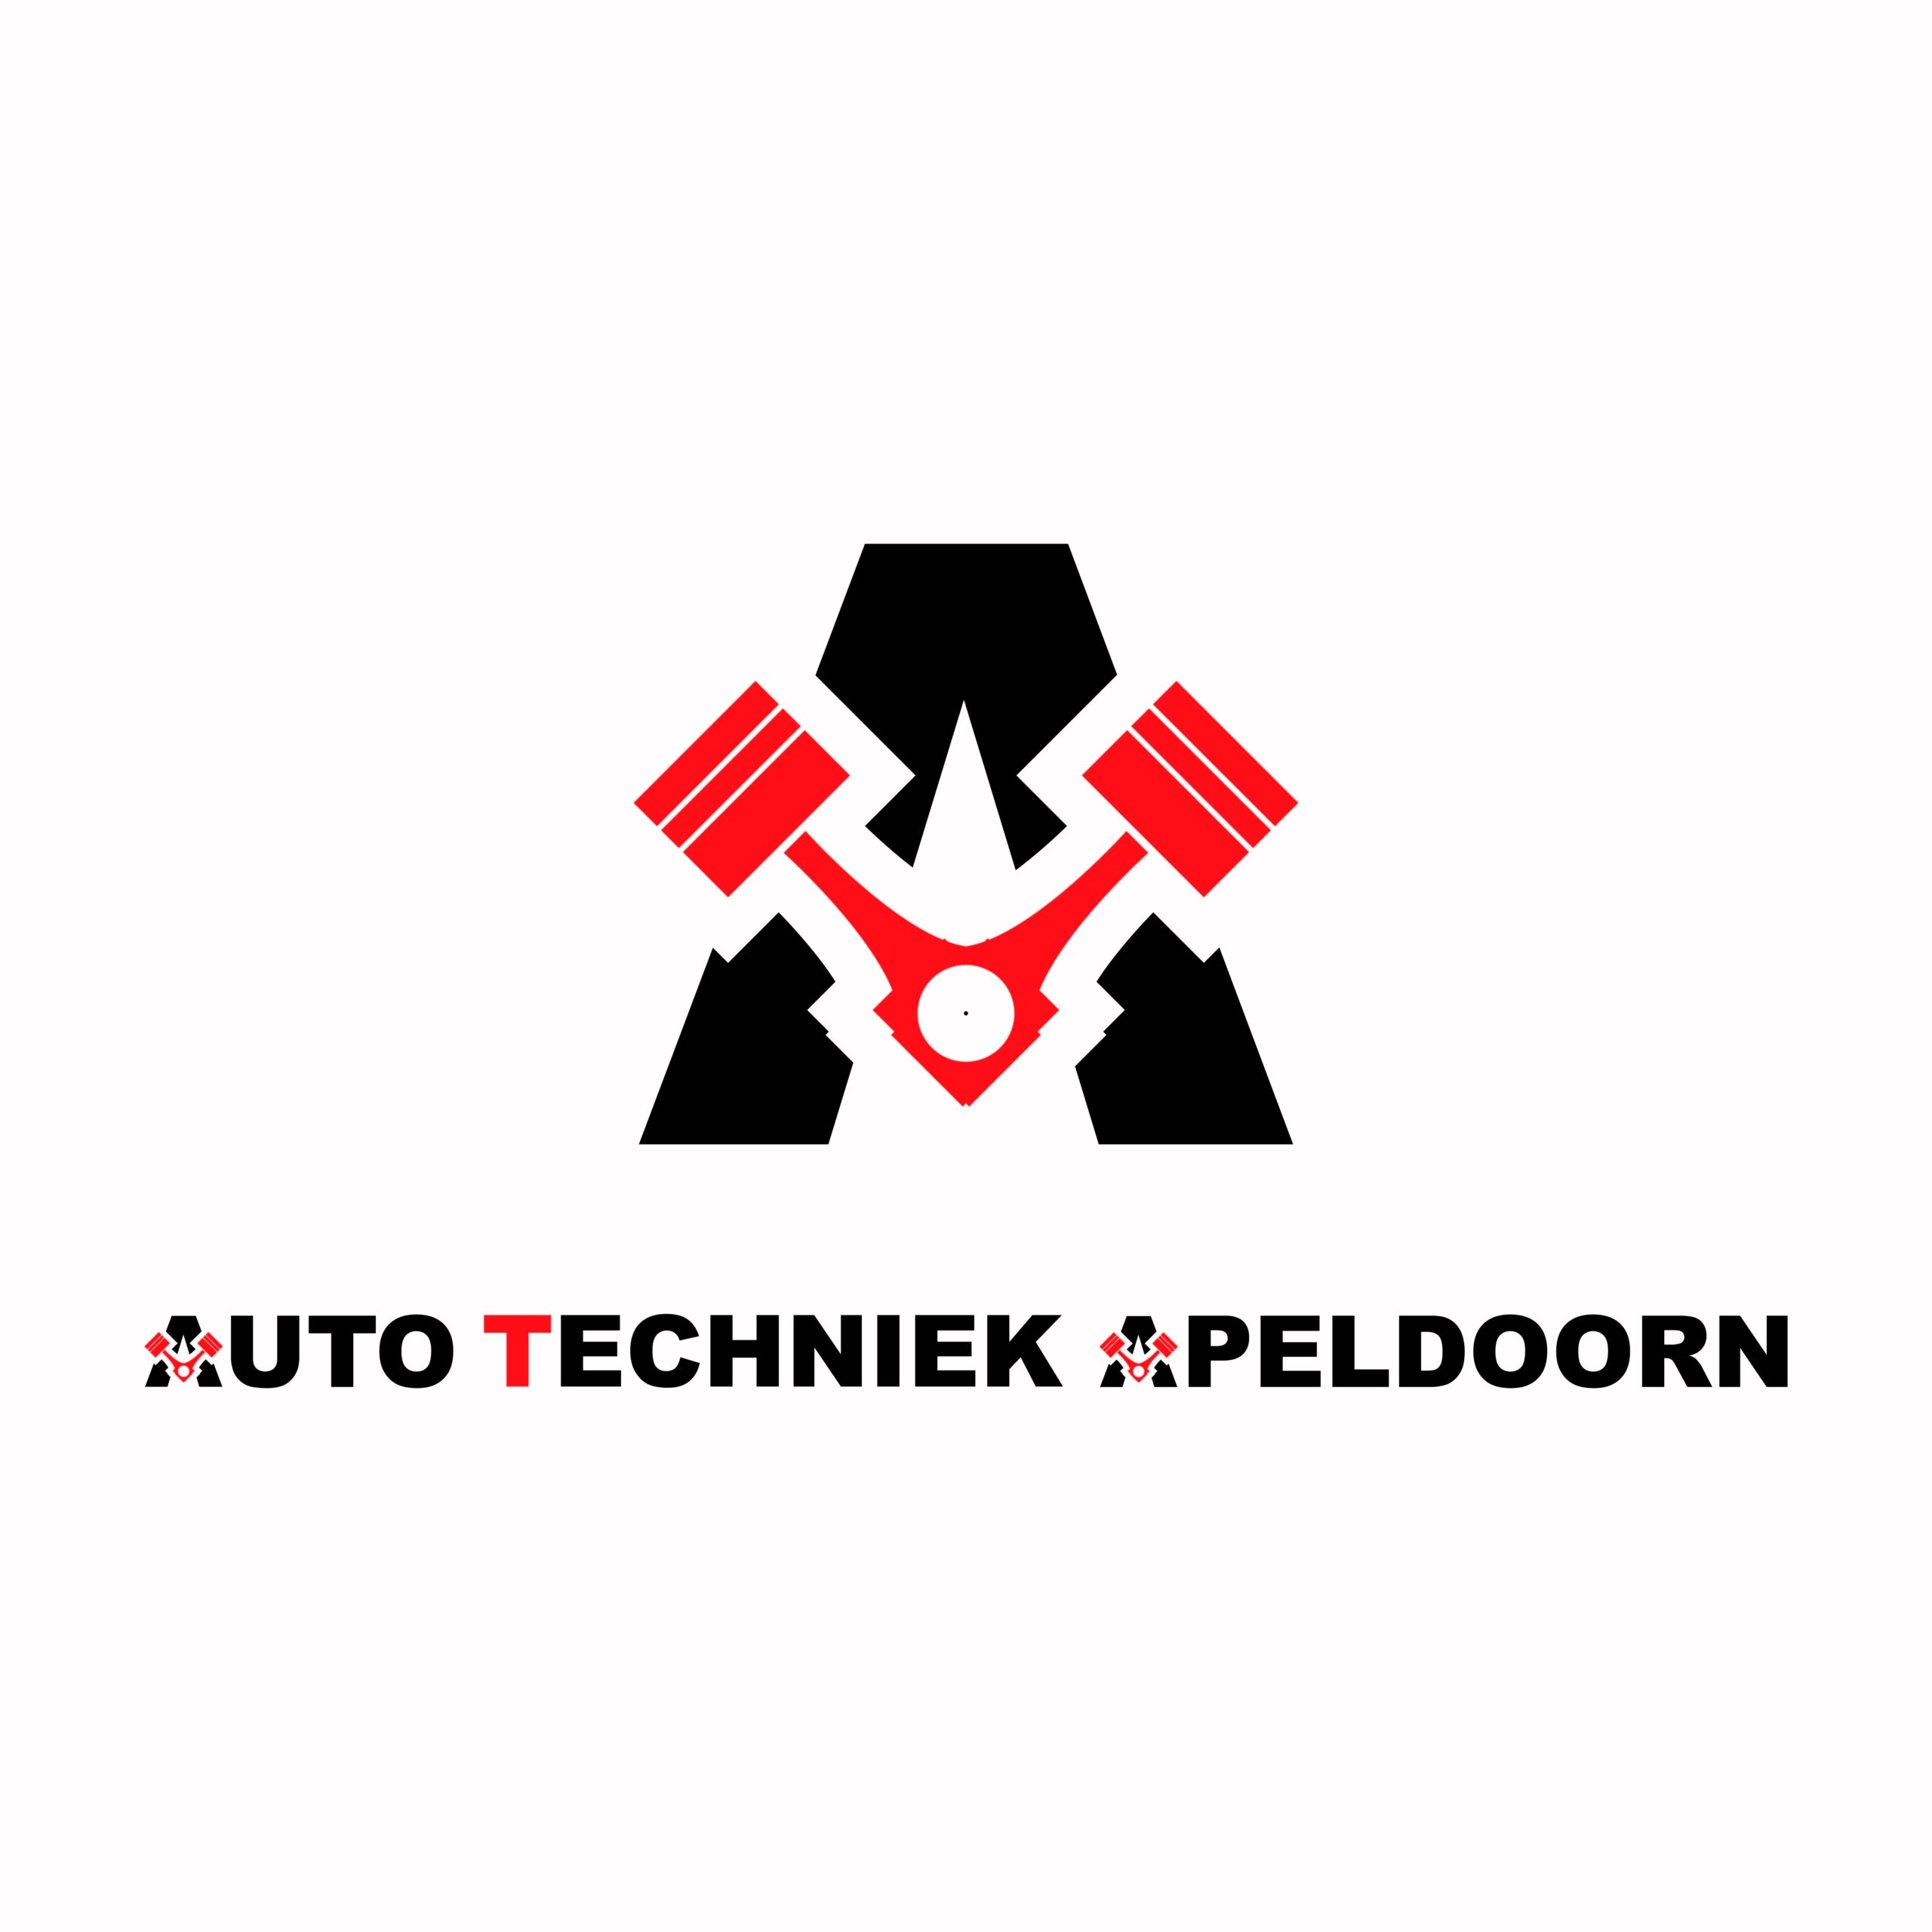 Autotechniek apd